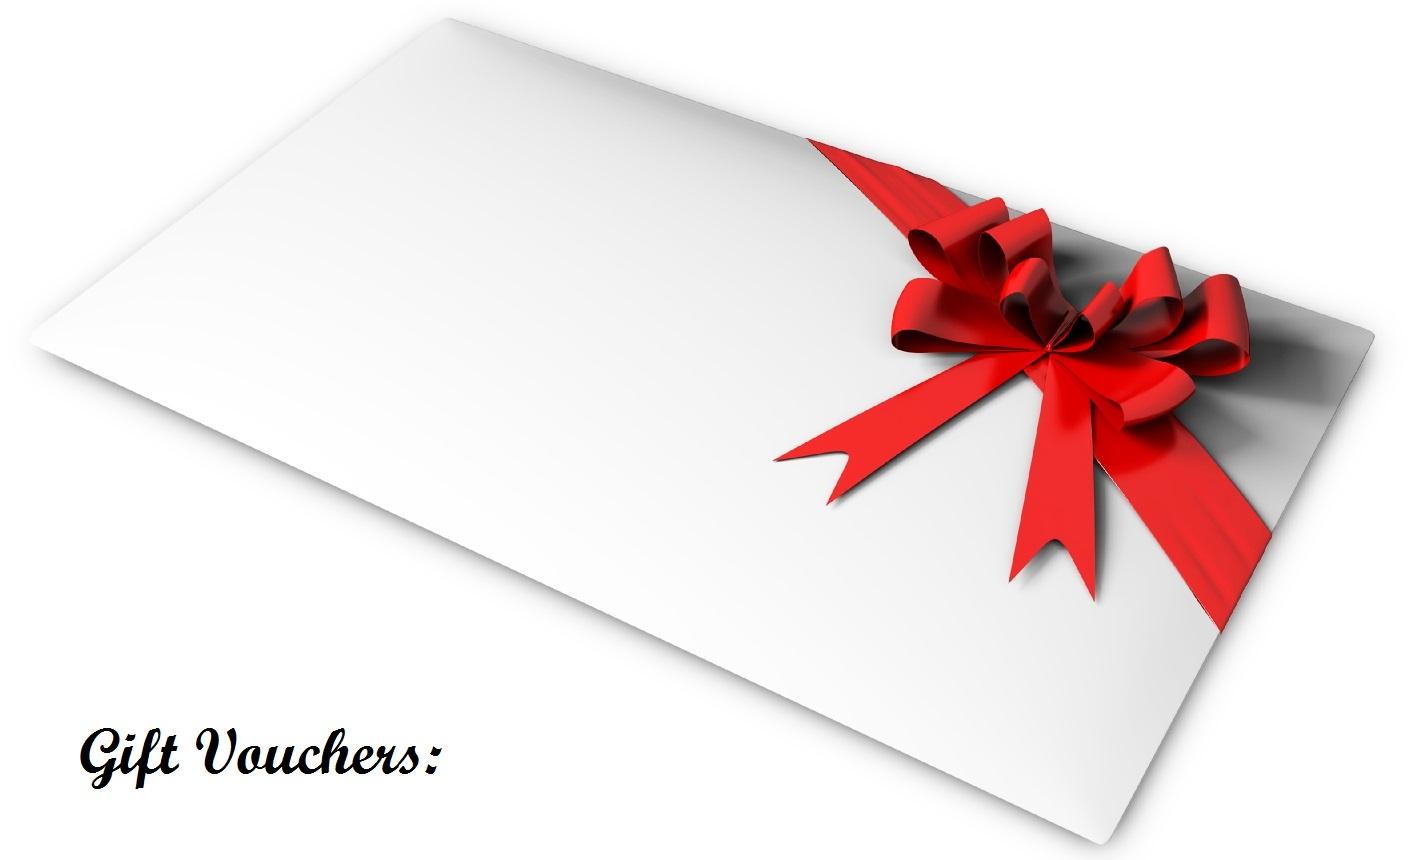 Gift-Vouchers for your Sister for raksha bandhan